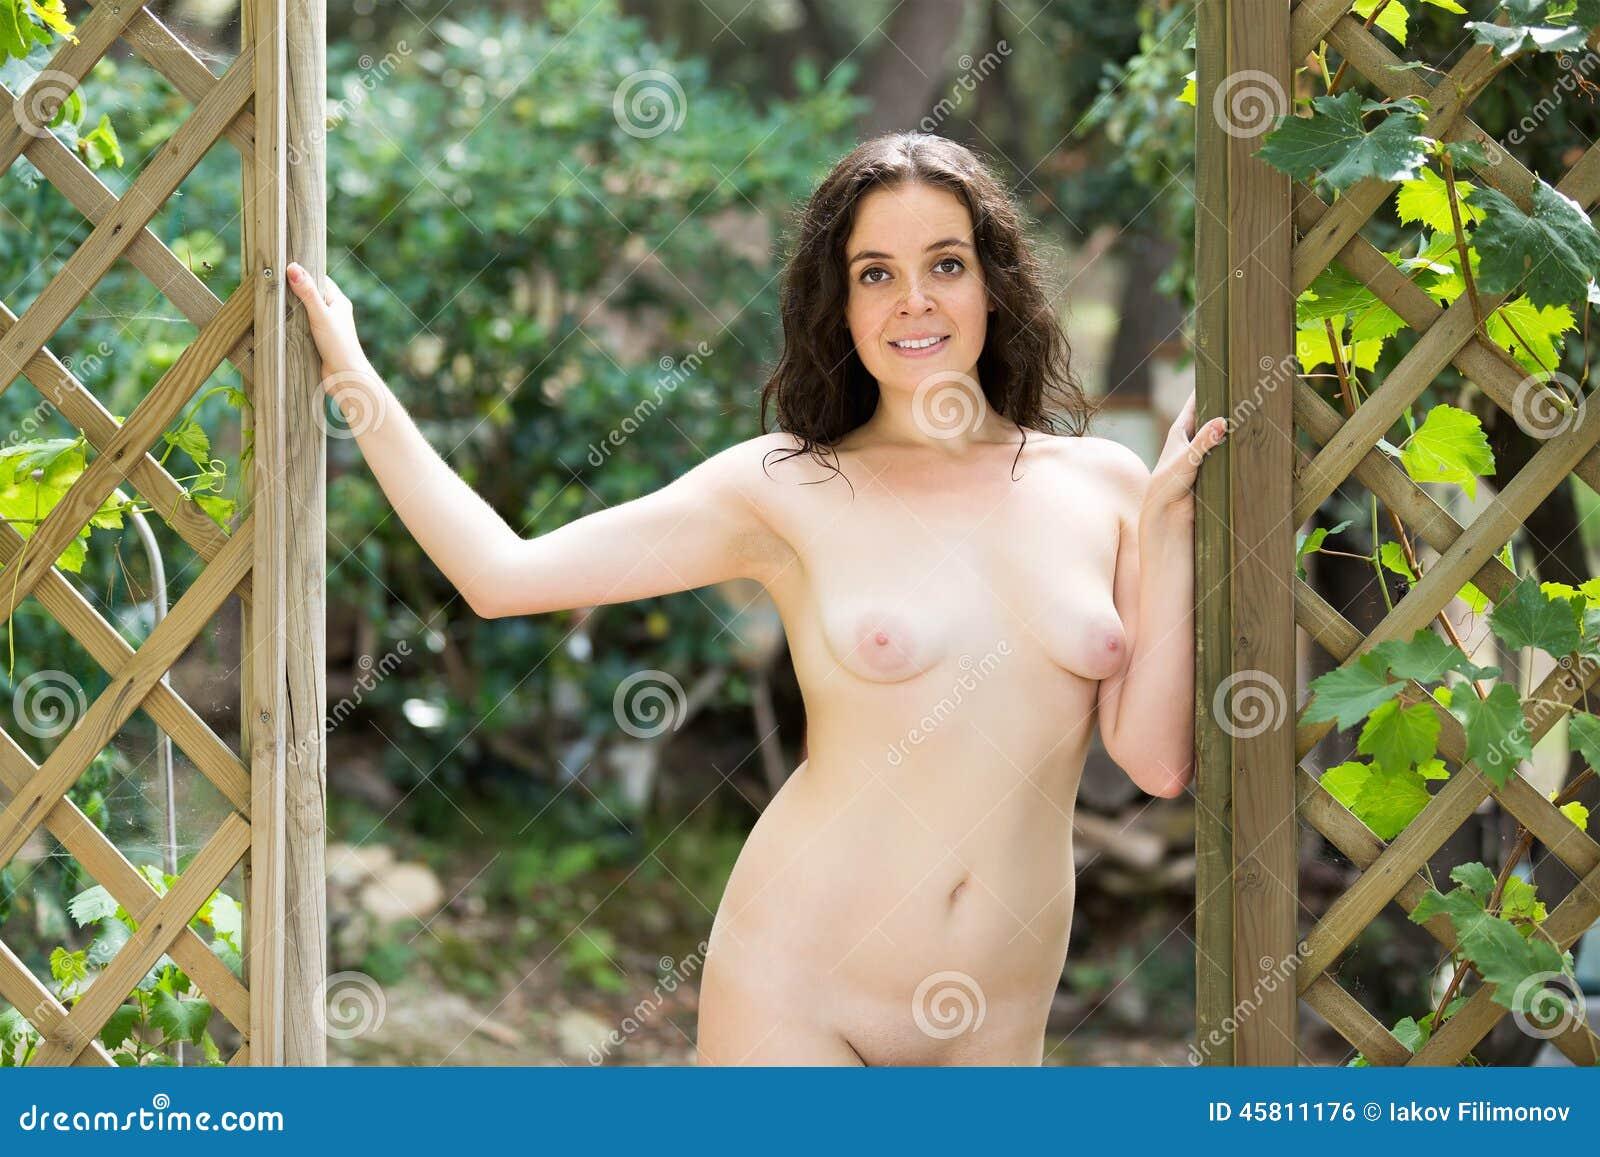 phot series of girls naked in backyard